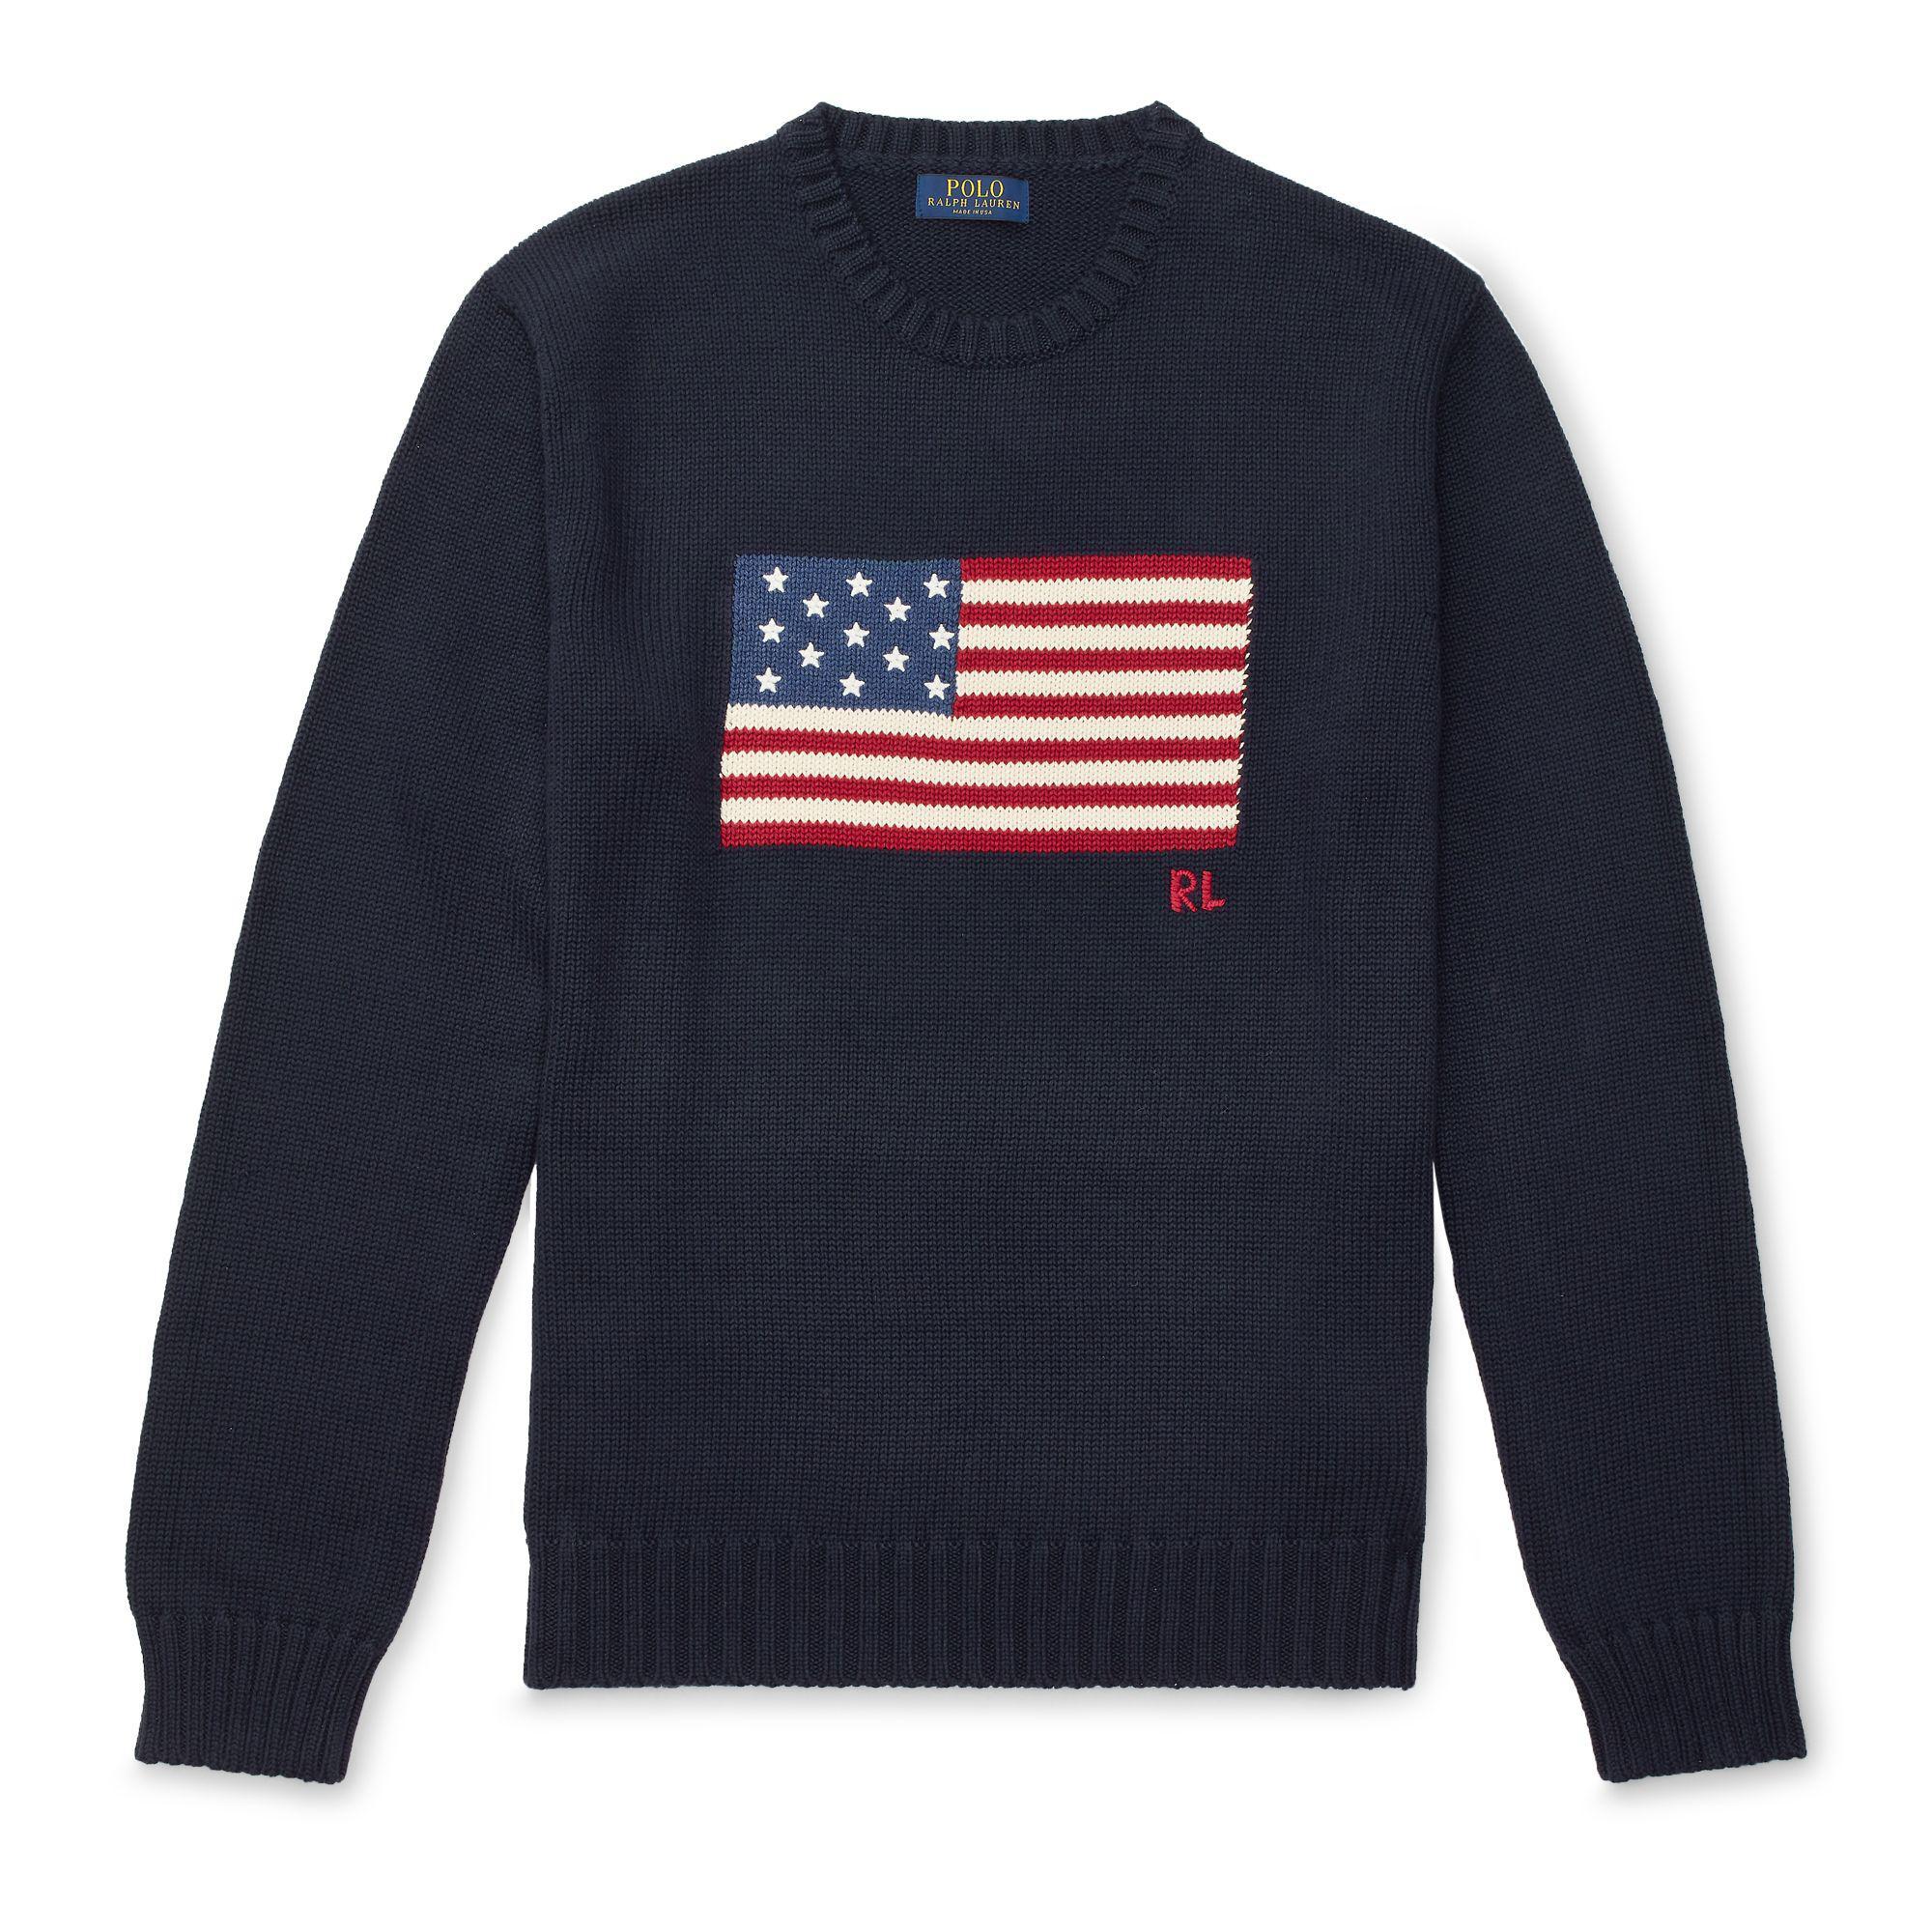 8196cd458e7d Polo Ralph Lauren Men s American Flag Cotton Sweater in Blue for Men ...